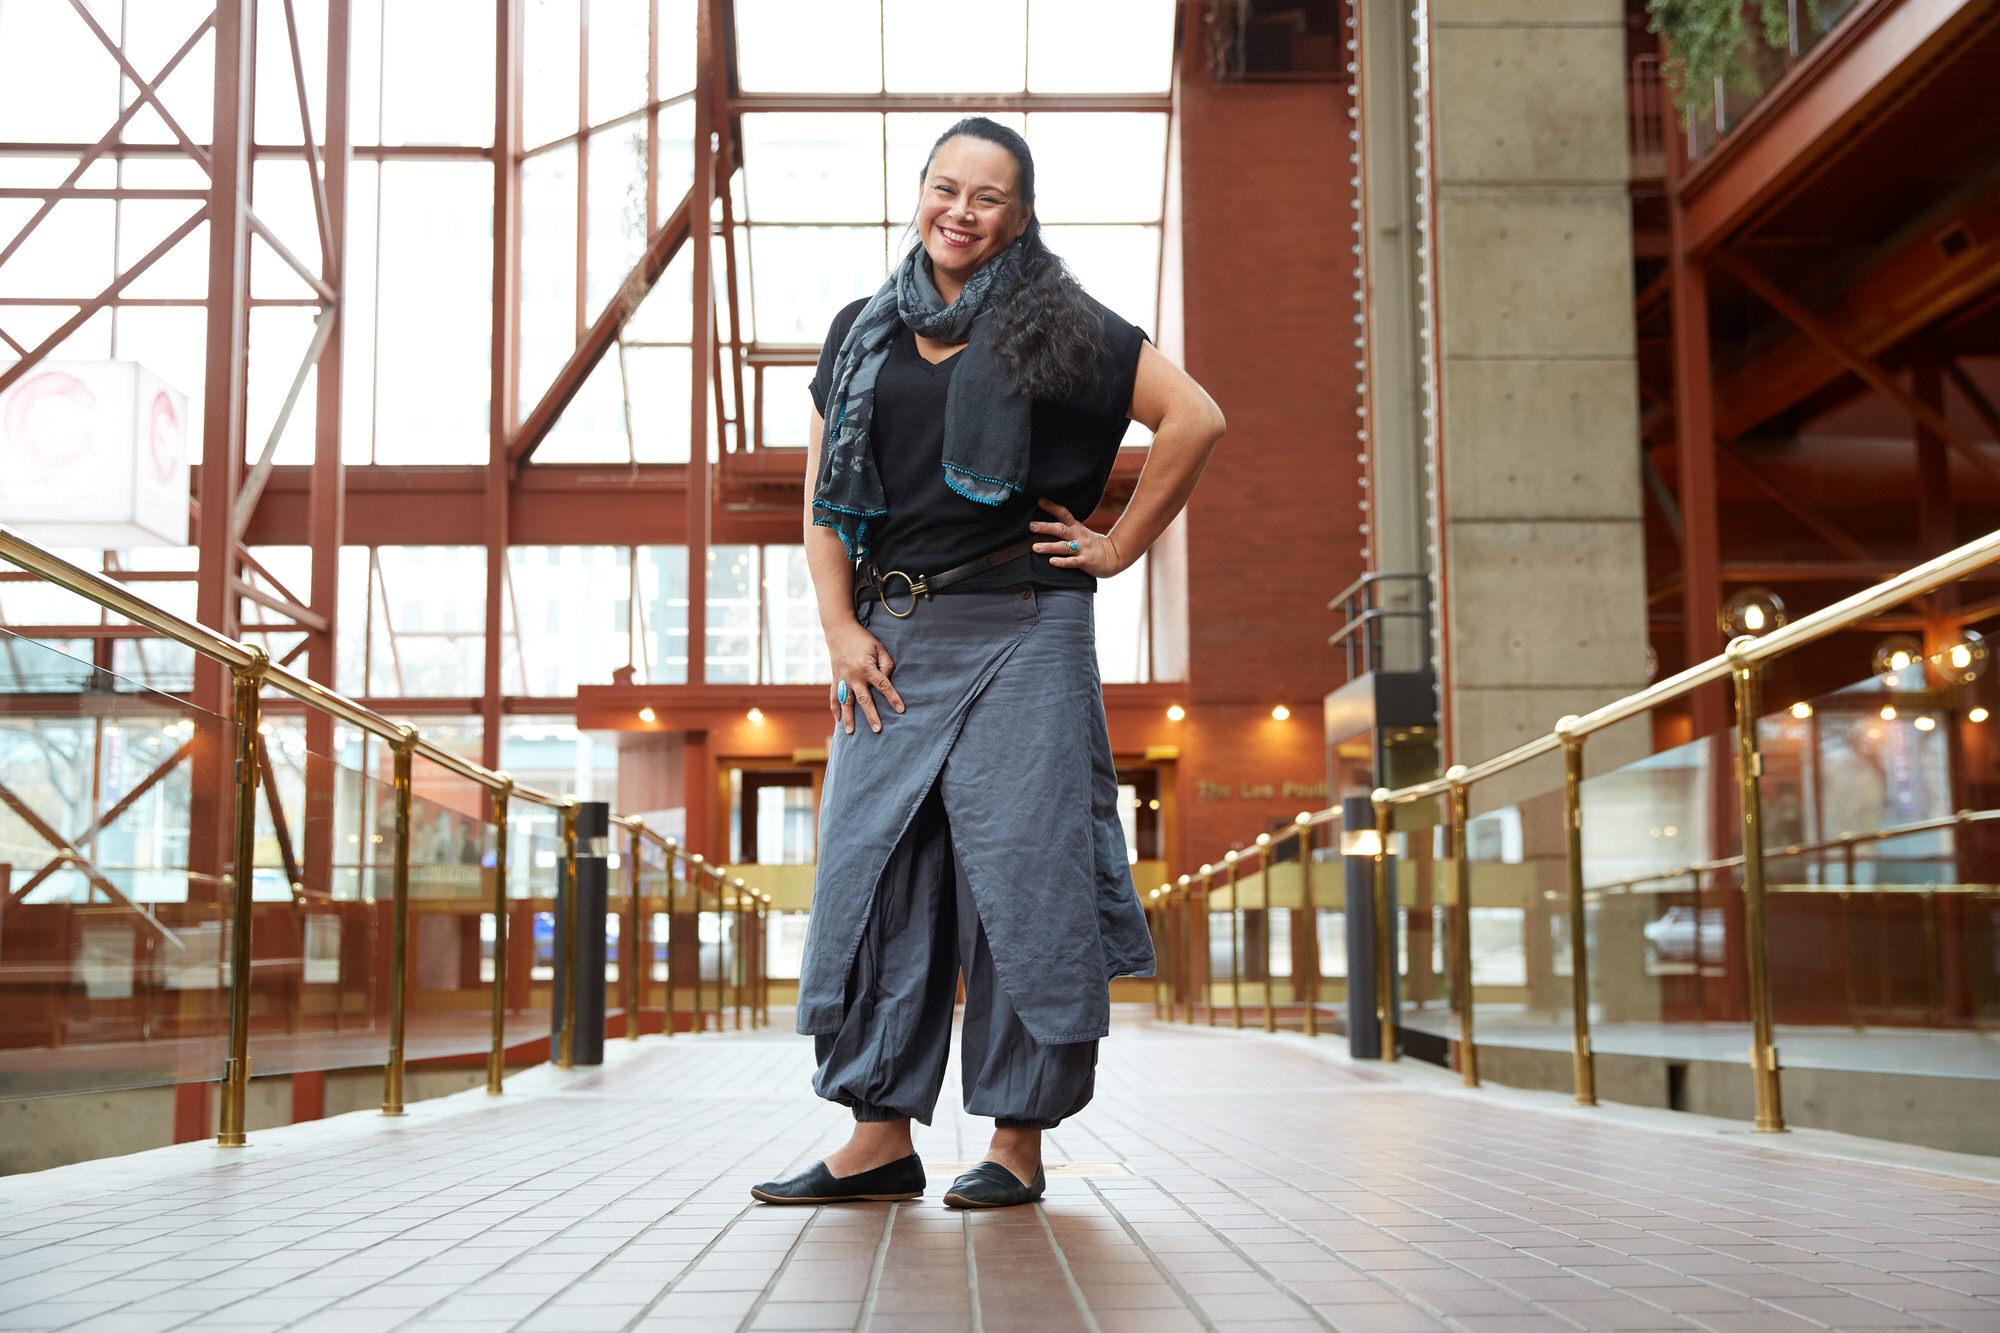 Christine-Fredricks-Citadel-Theatre-Tatawaw-Founding-Member-Ryan-Parker-Photography-Edmonton-Alberta.jpg